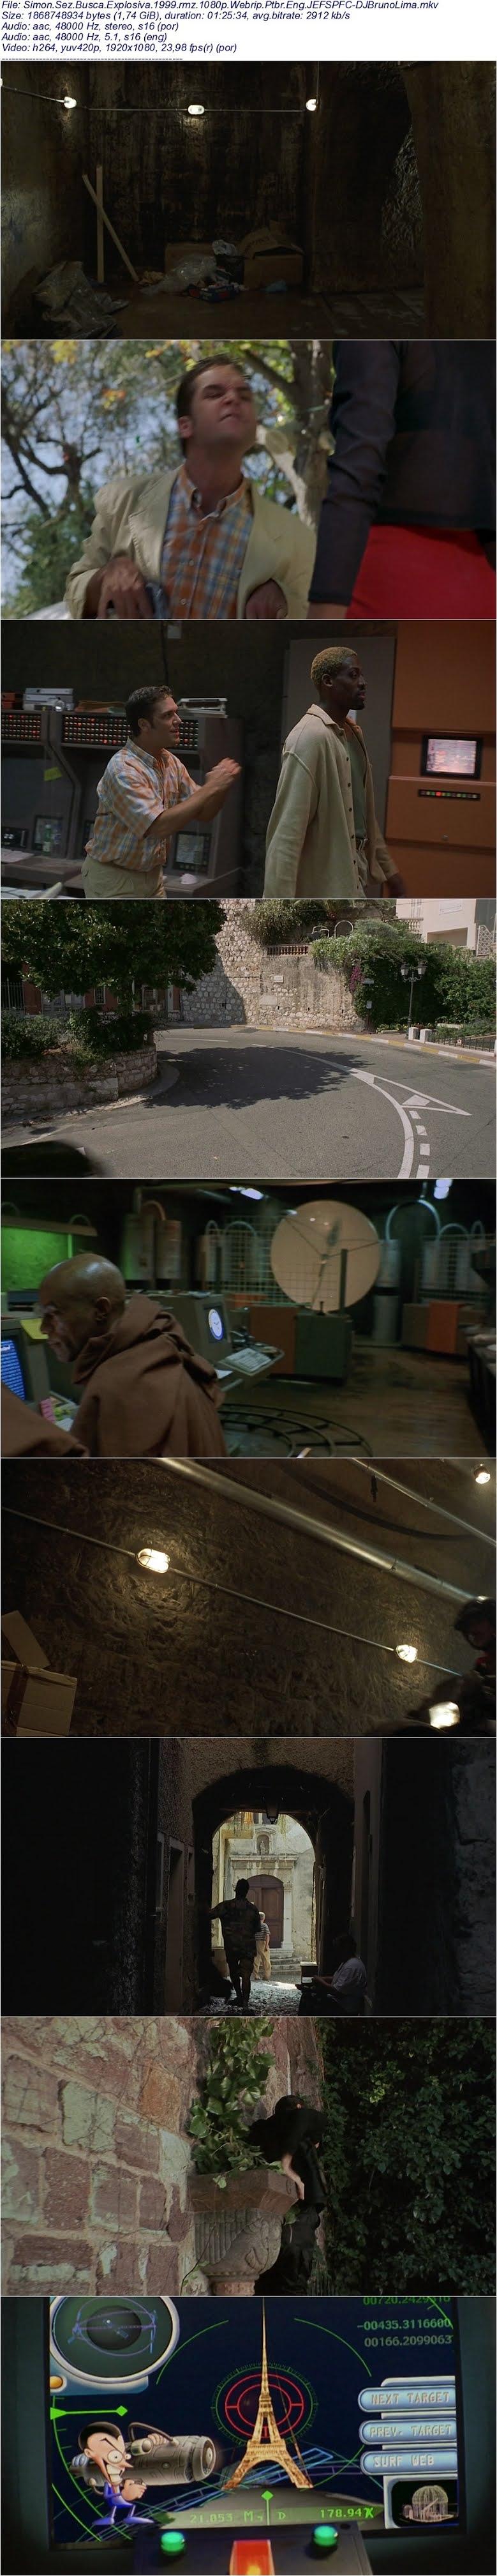 BUSCA EXPLOSIVA (DUAL ÁUDIO/1080P) – 1999 Simon.Sez.Busca.Explosiva.1999.rmz.1080p.Webrip.Ptbr.Eng.JEFSPFC-DJBrunoLima